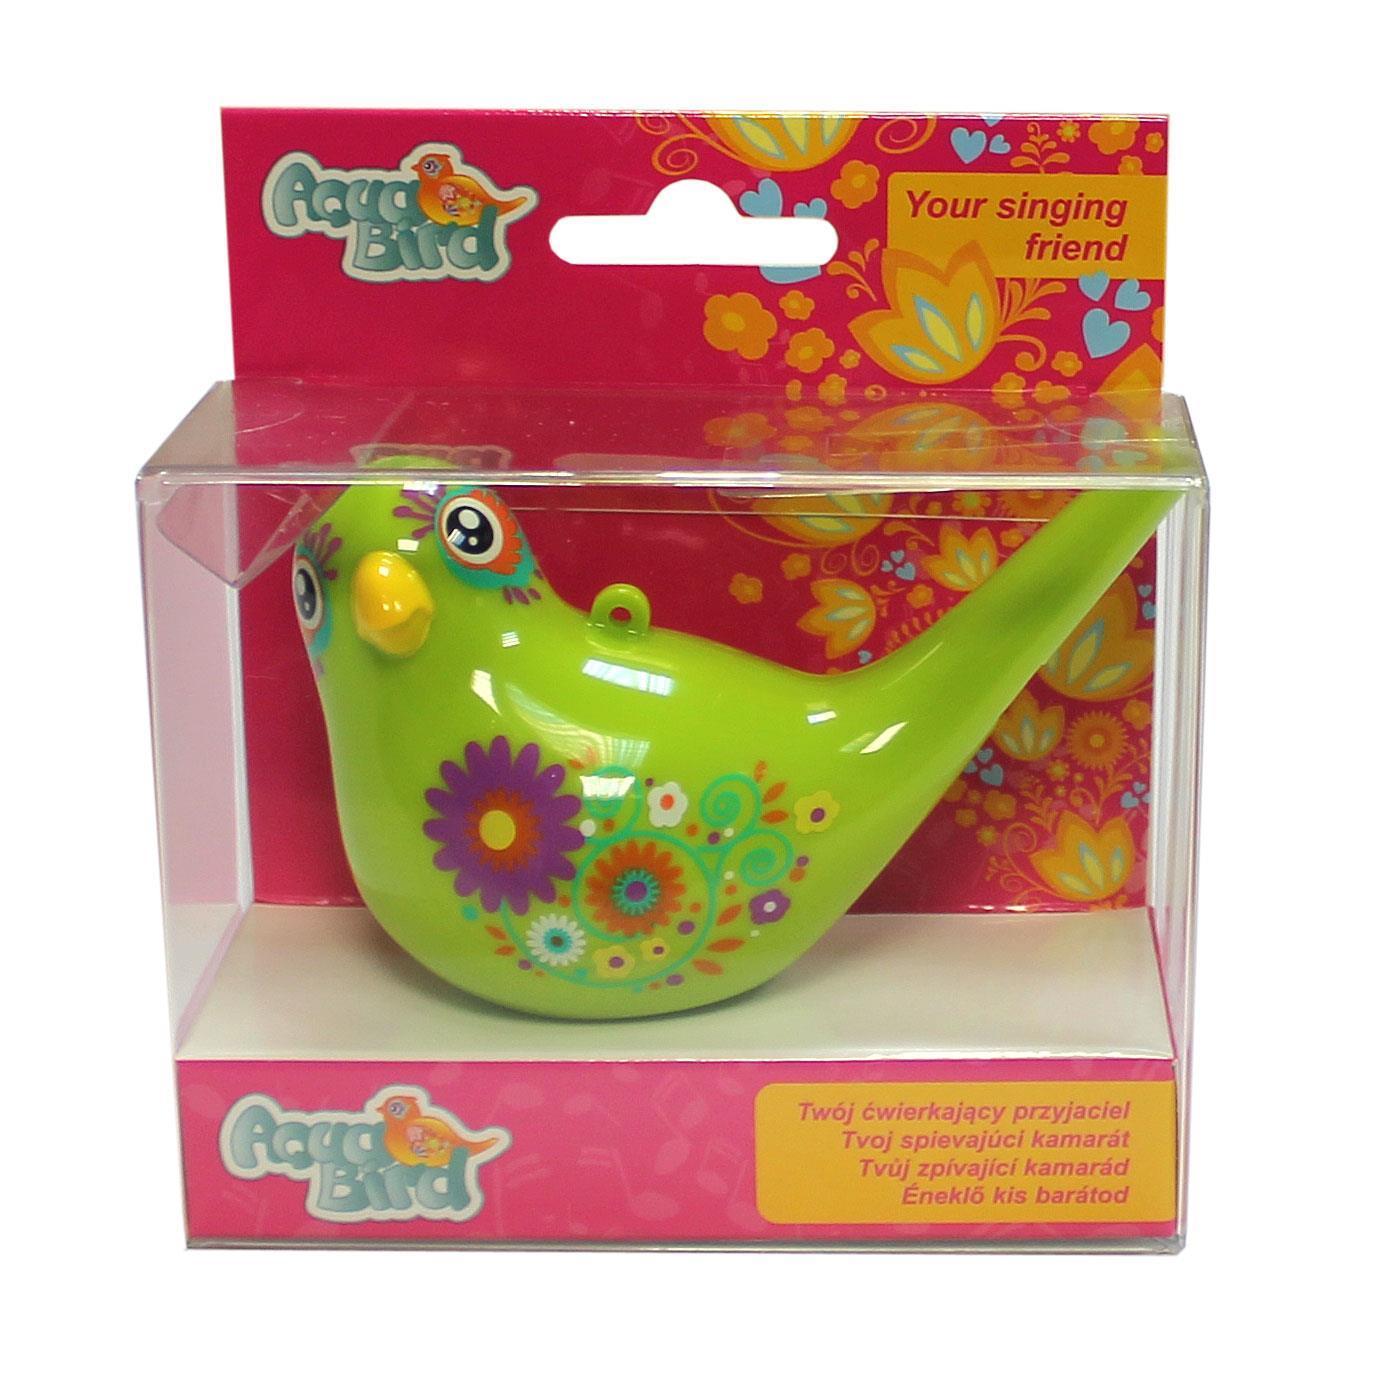 Aqua bird- wodny gwizdek